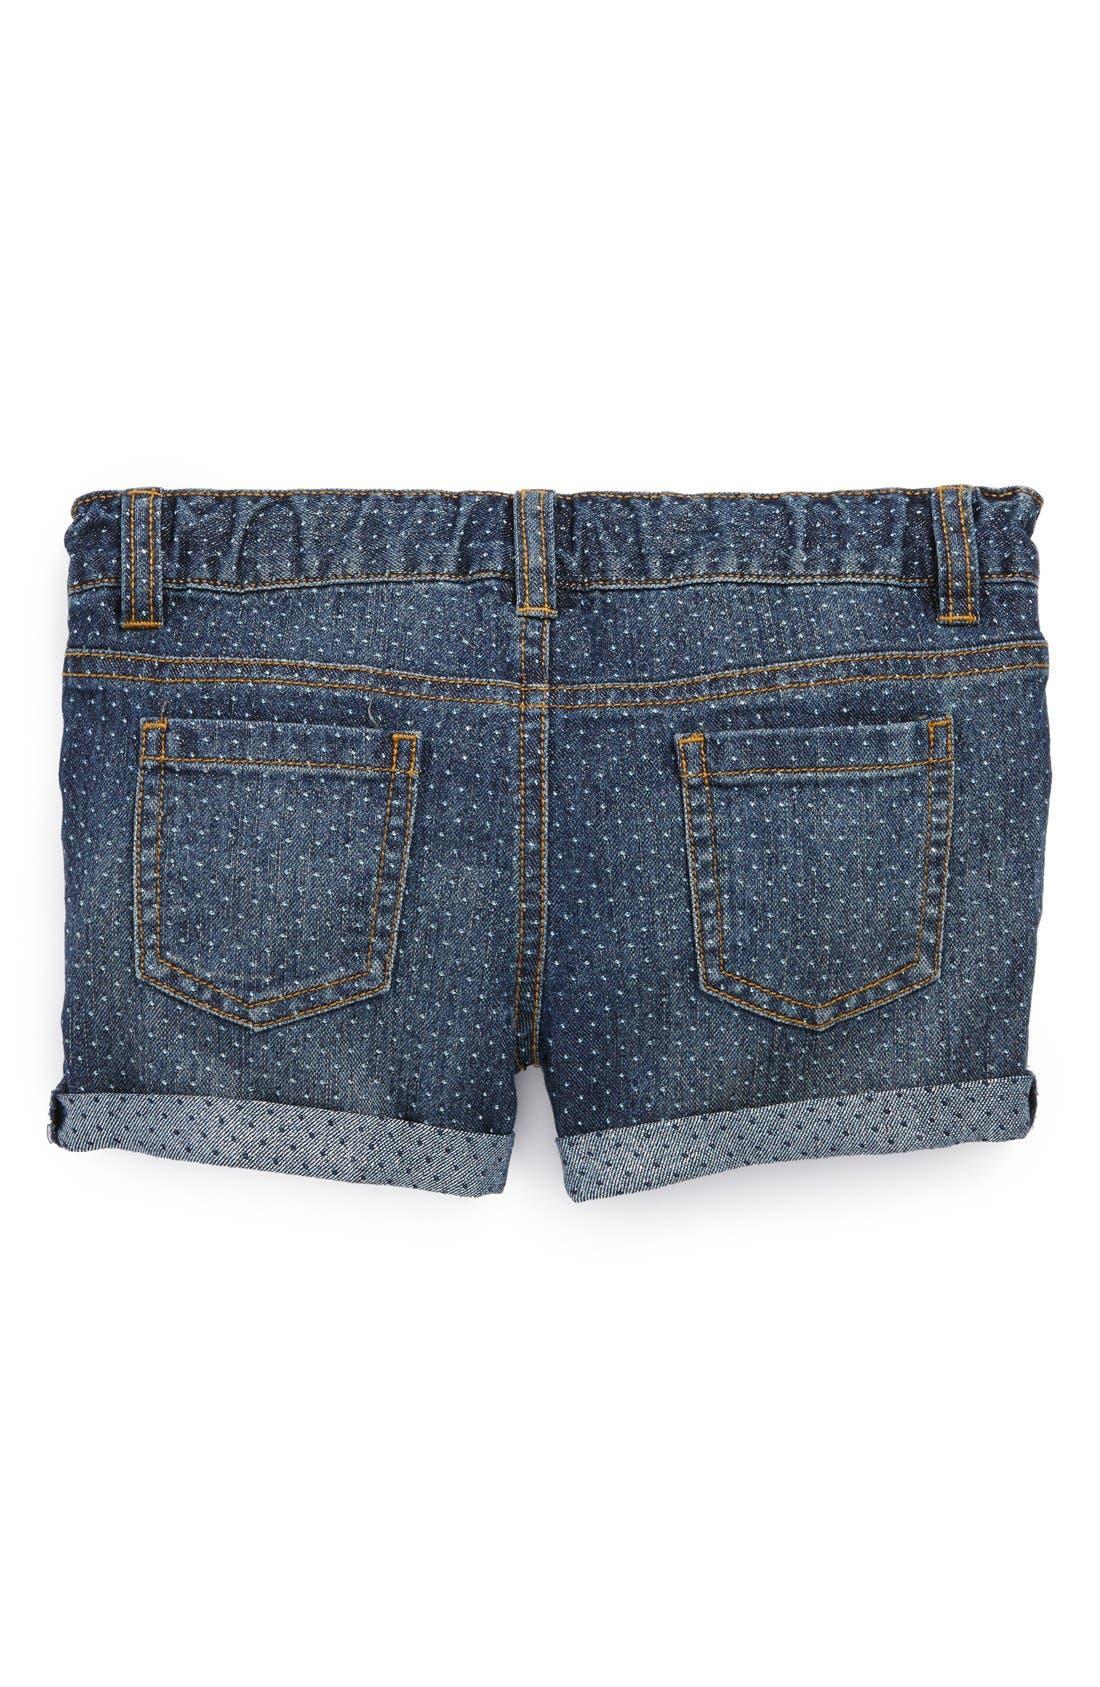 Alternate Image 1 Selected - Peek 'Harper' Denim Shorts (Toddler Girls, Little Girls & Big Girls)